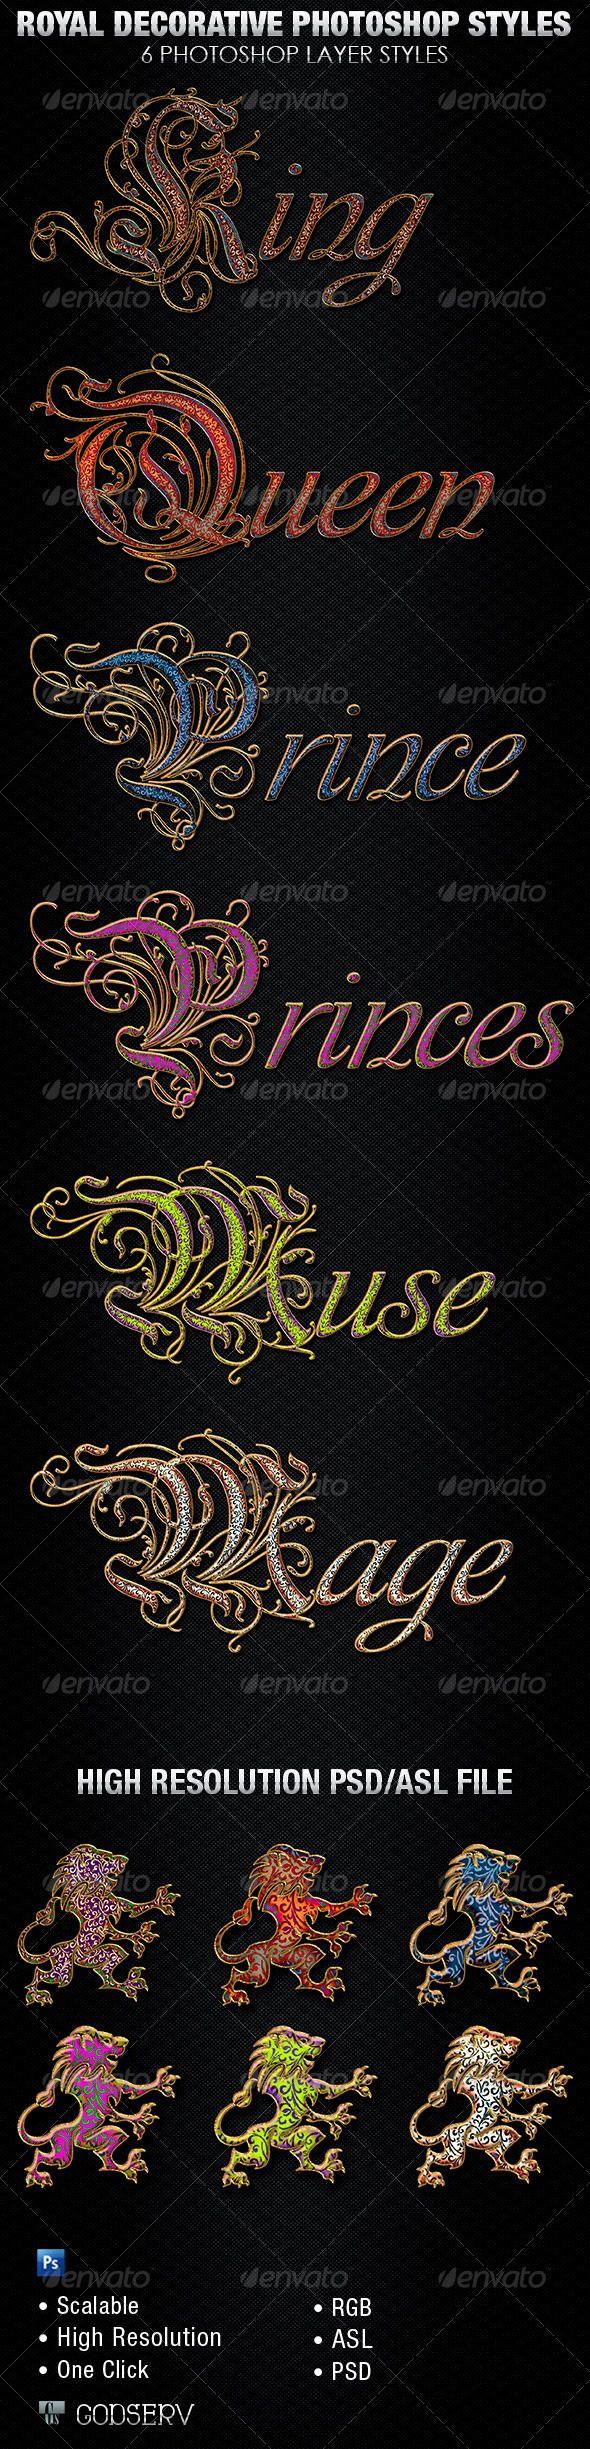 Royal Decorative Photoshop Layer Styles -$6.00